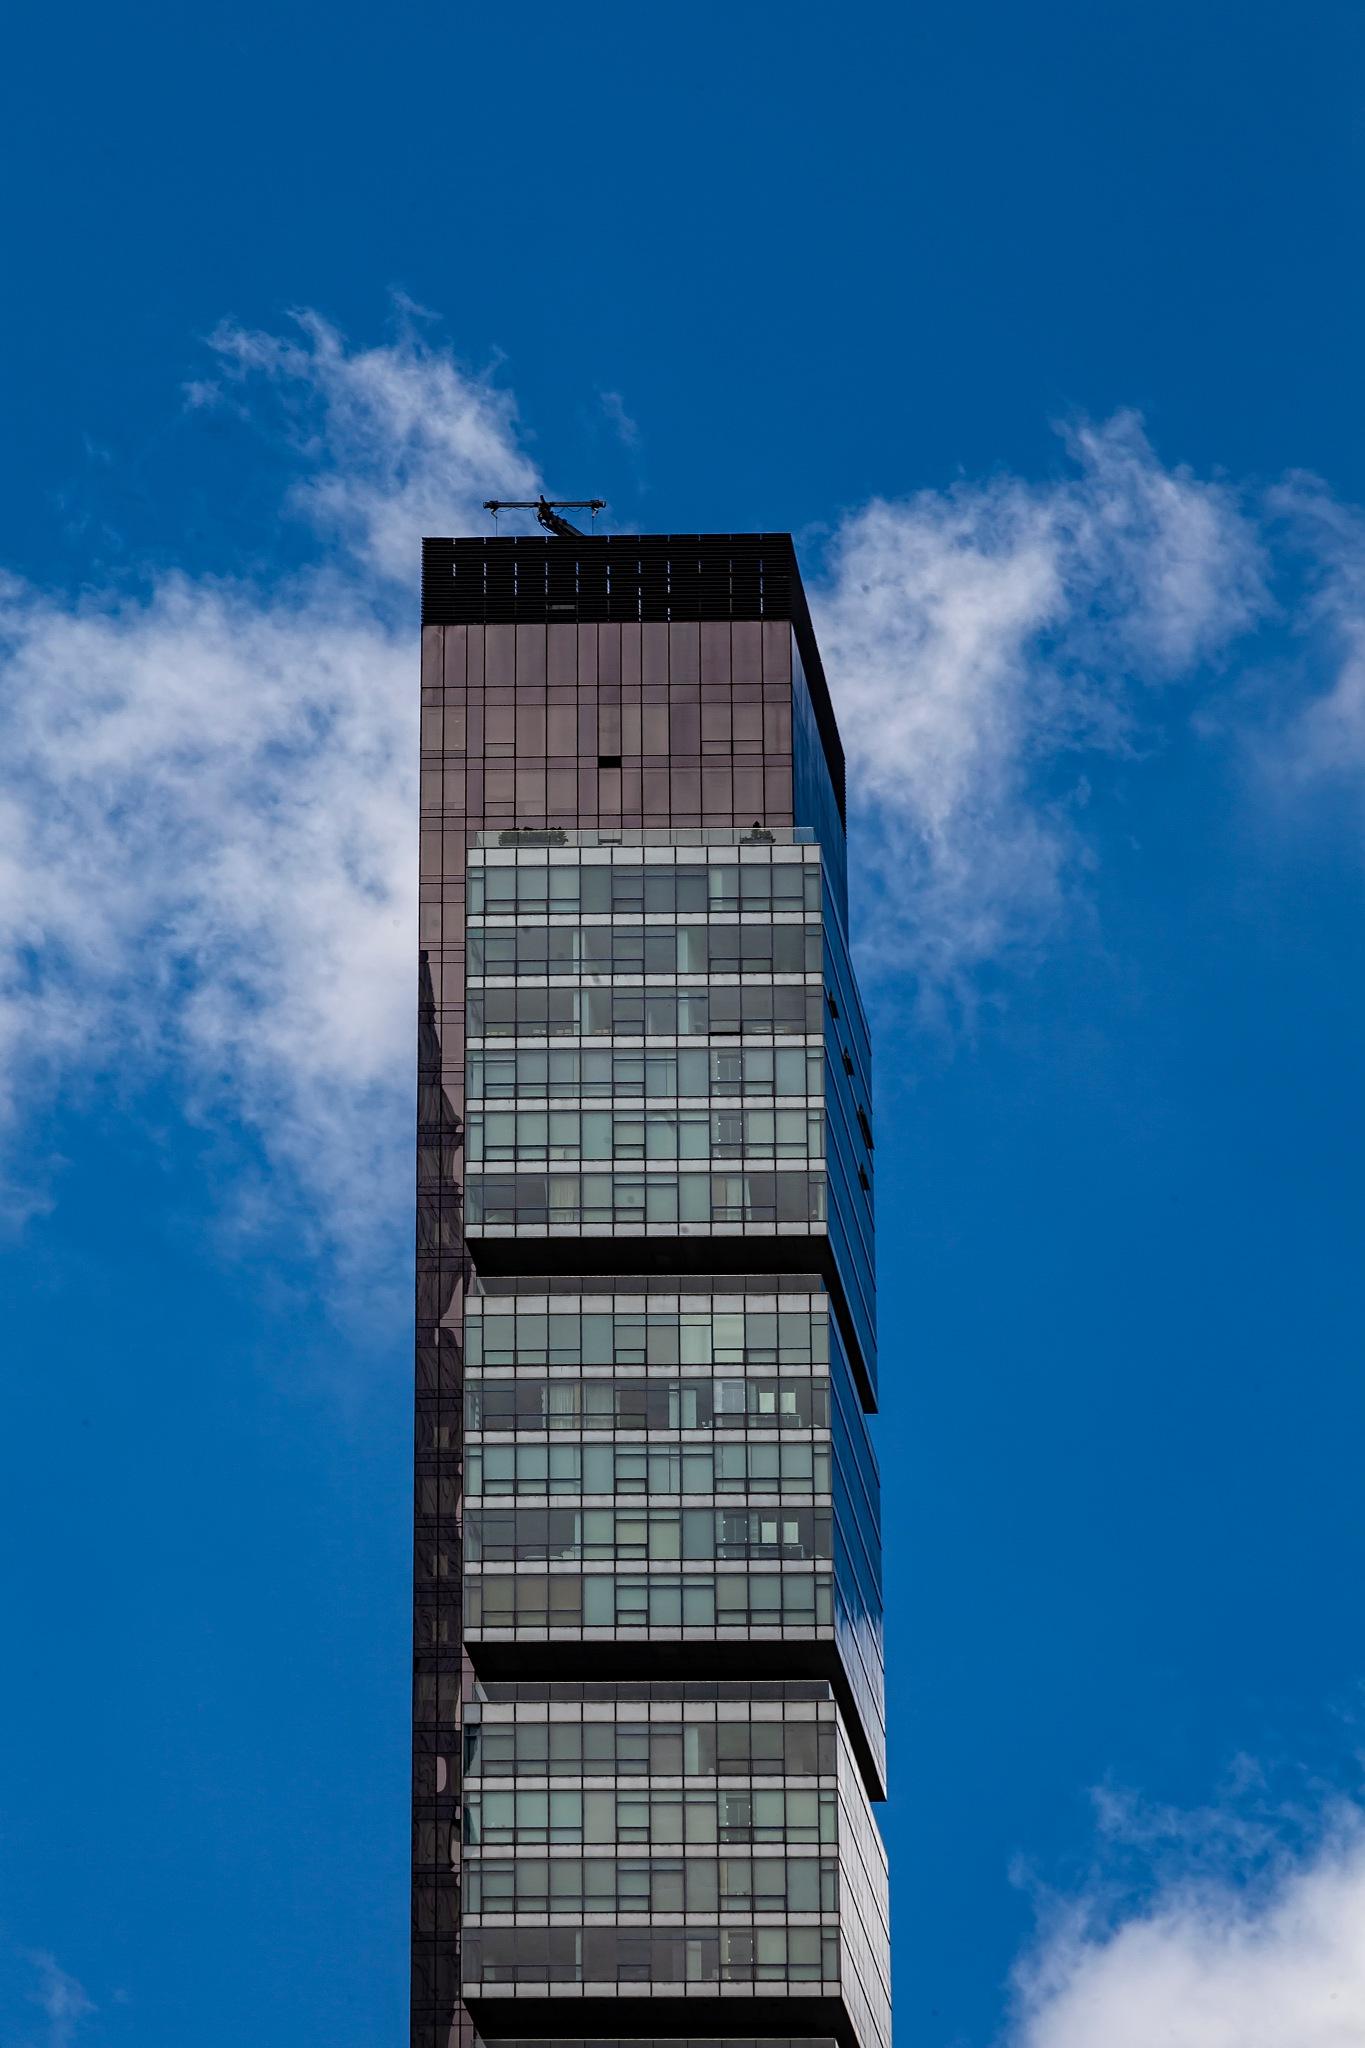 Glass High Rise NYC by robertullmann